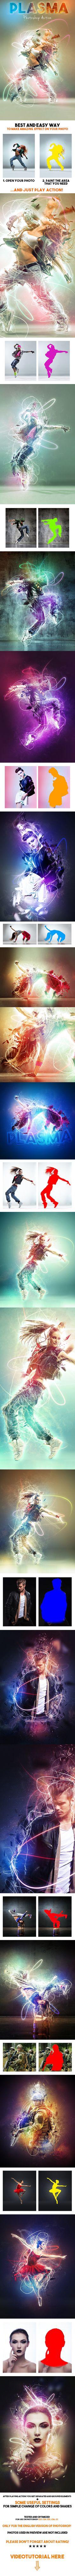 Plasma Photoshop Action #photoeffect Download: http://graphicriver.net/item/plasma-photoshop-action/12814548?ref=ksioks